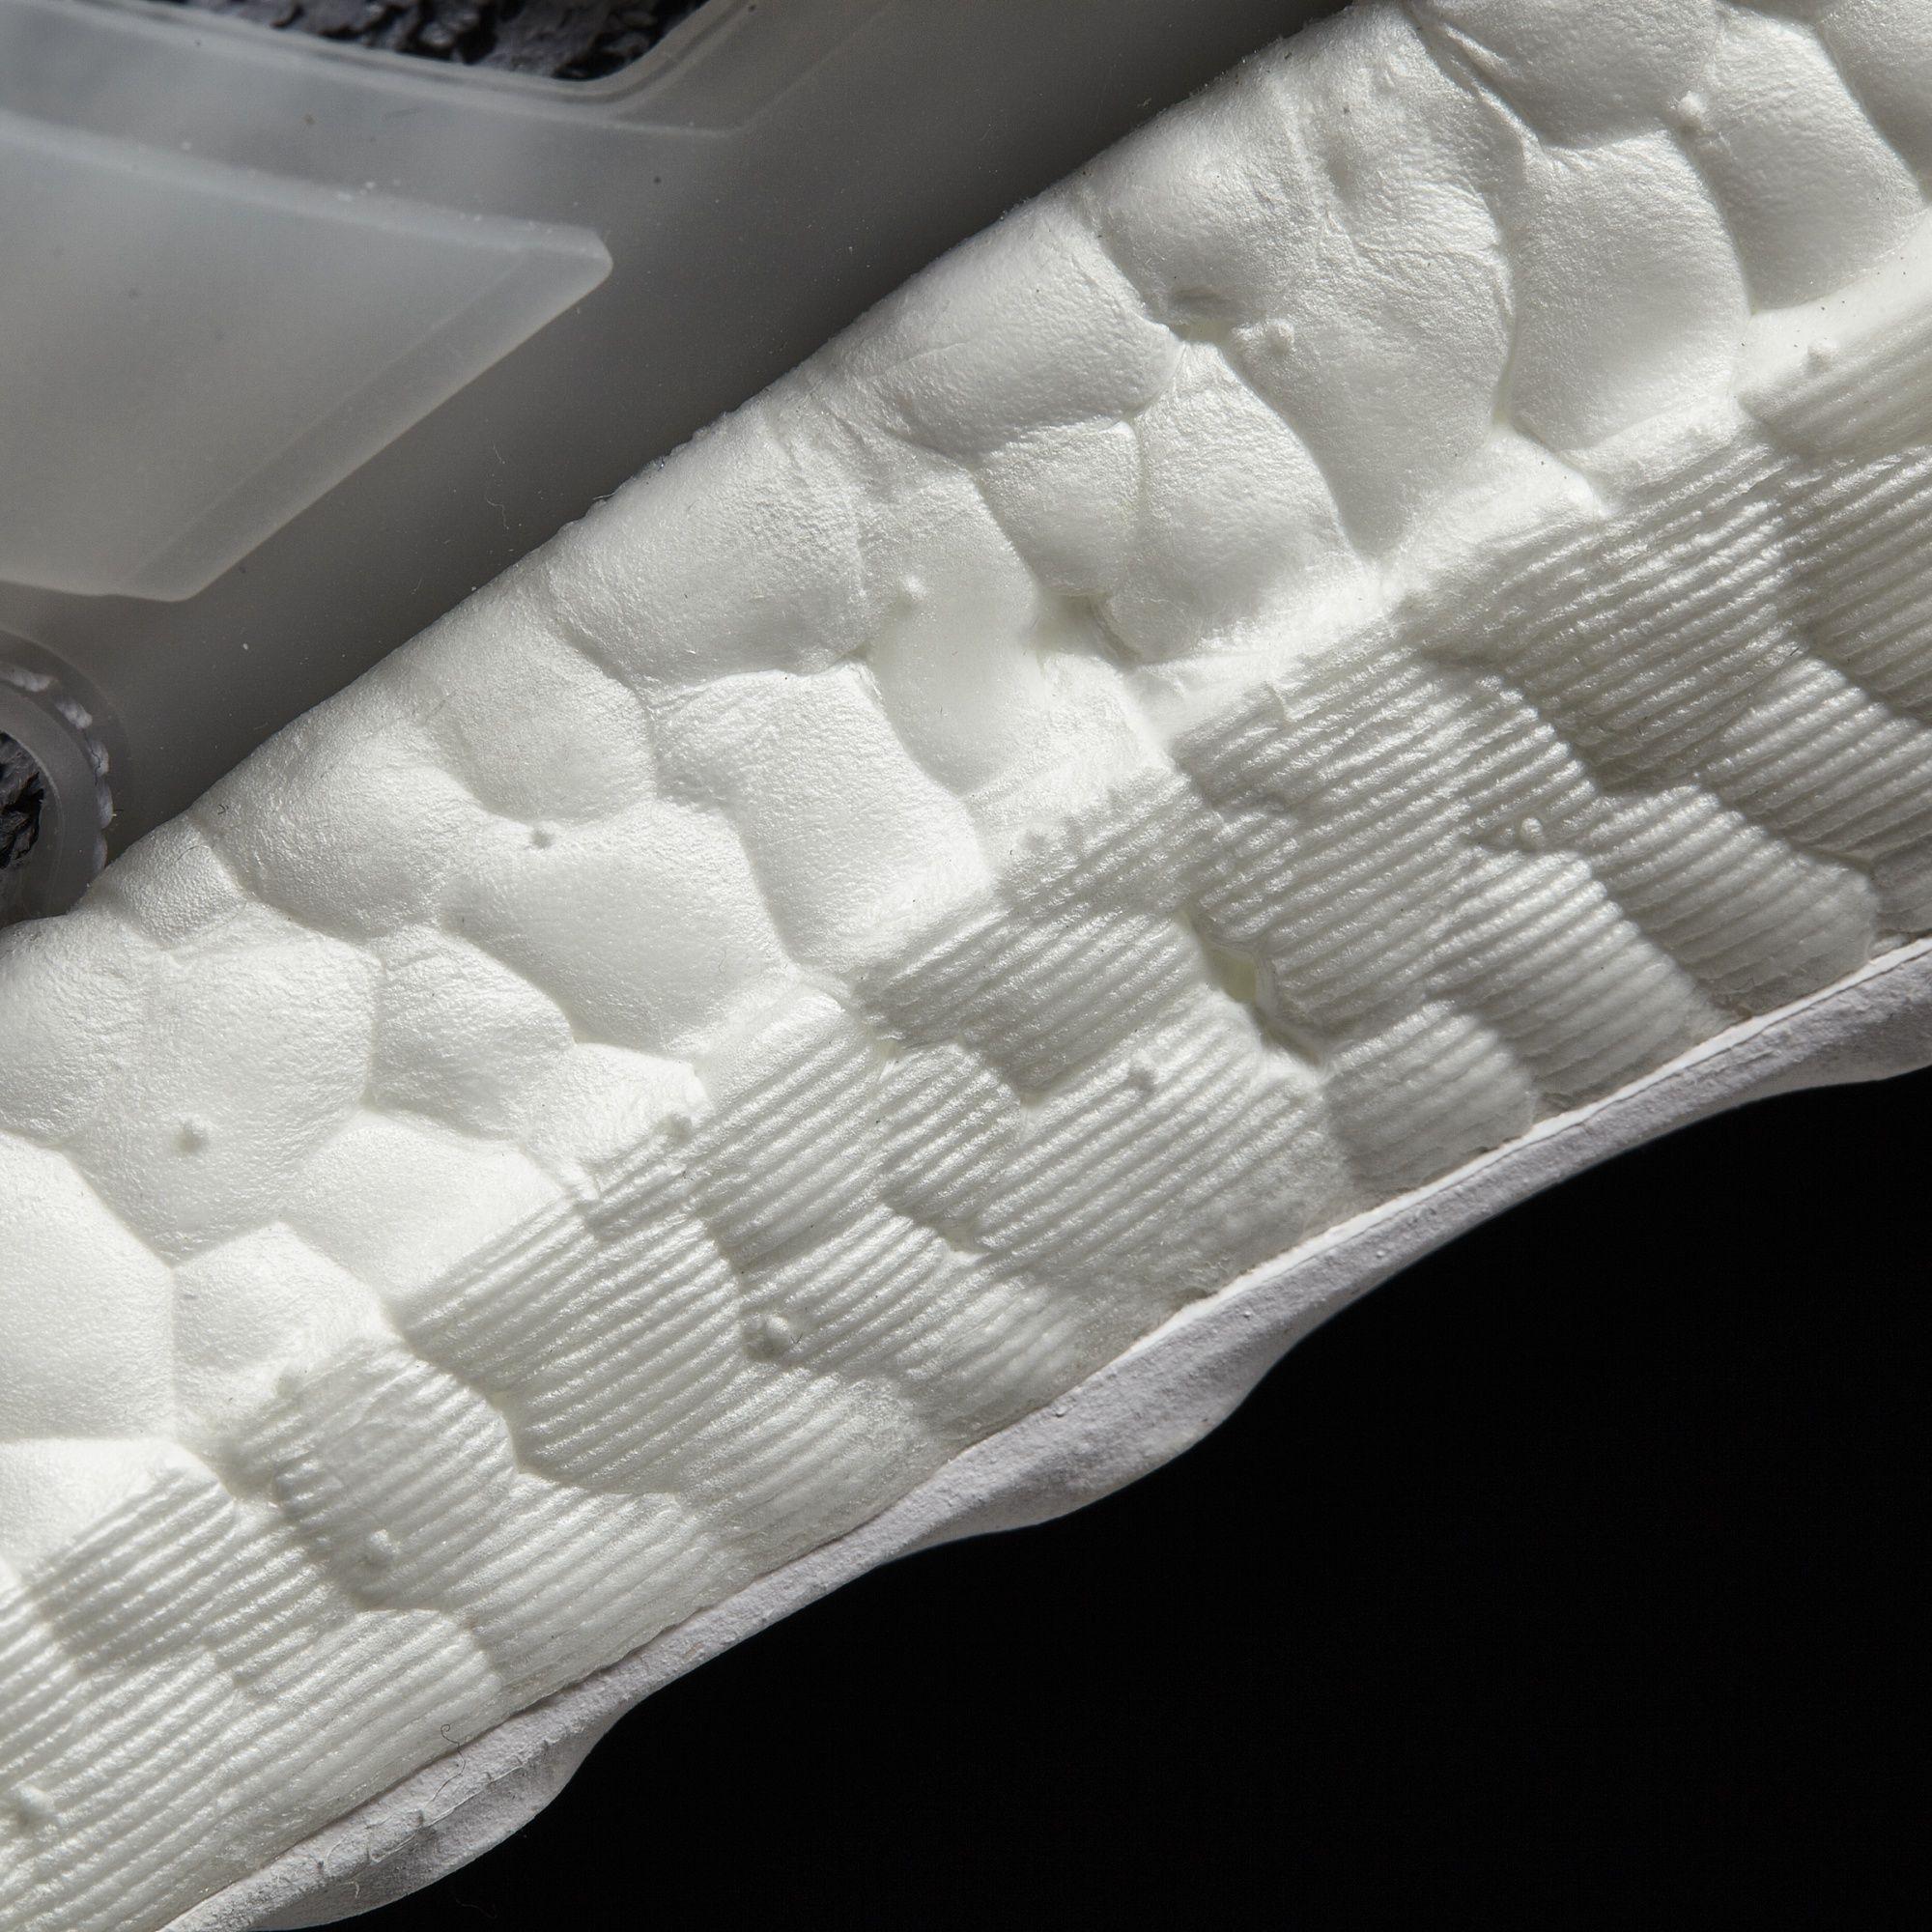 Adidas Ultra Boost 3.0 S80636 Oreo Midsole